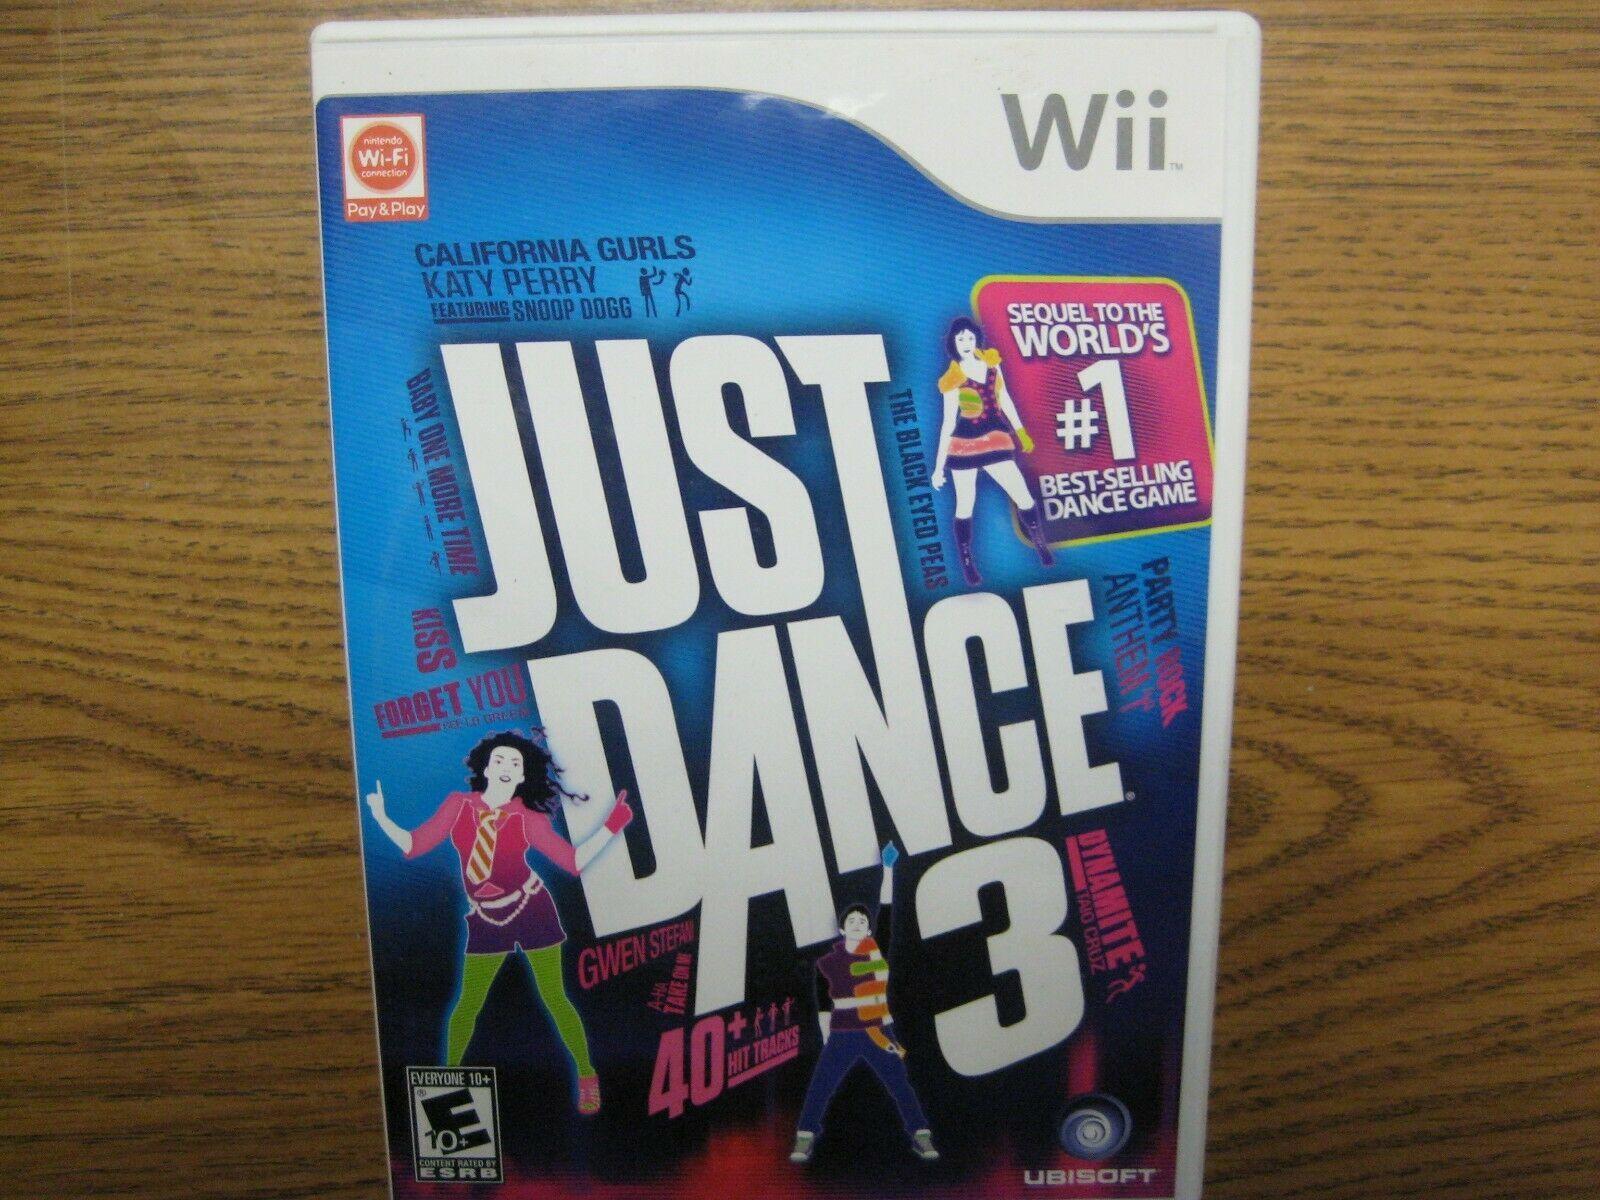 Just Dance 3 JD3 Nintendo Wii Ubisoft Dance Exercise Game - $12.75